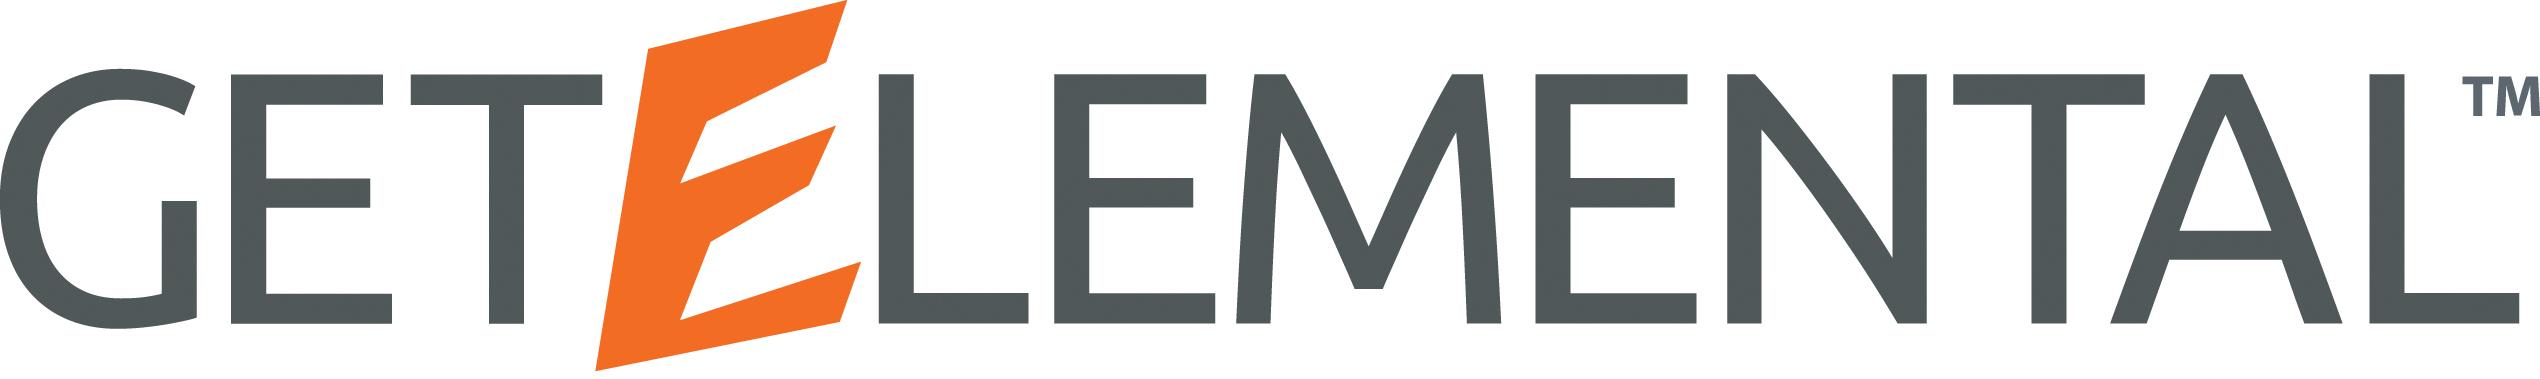 Get Elemental